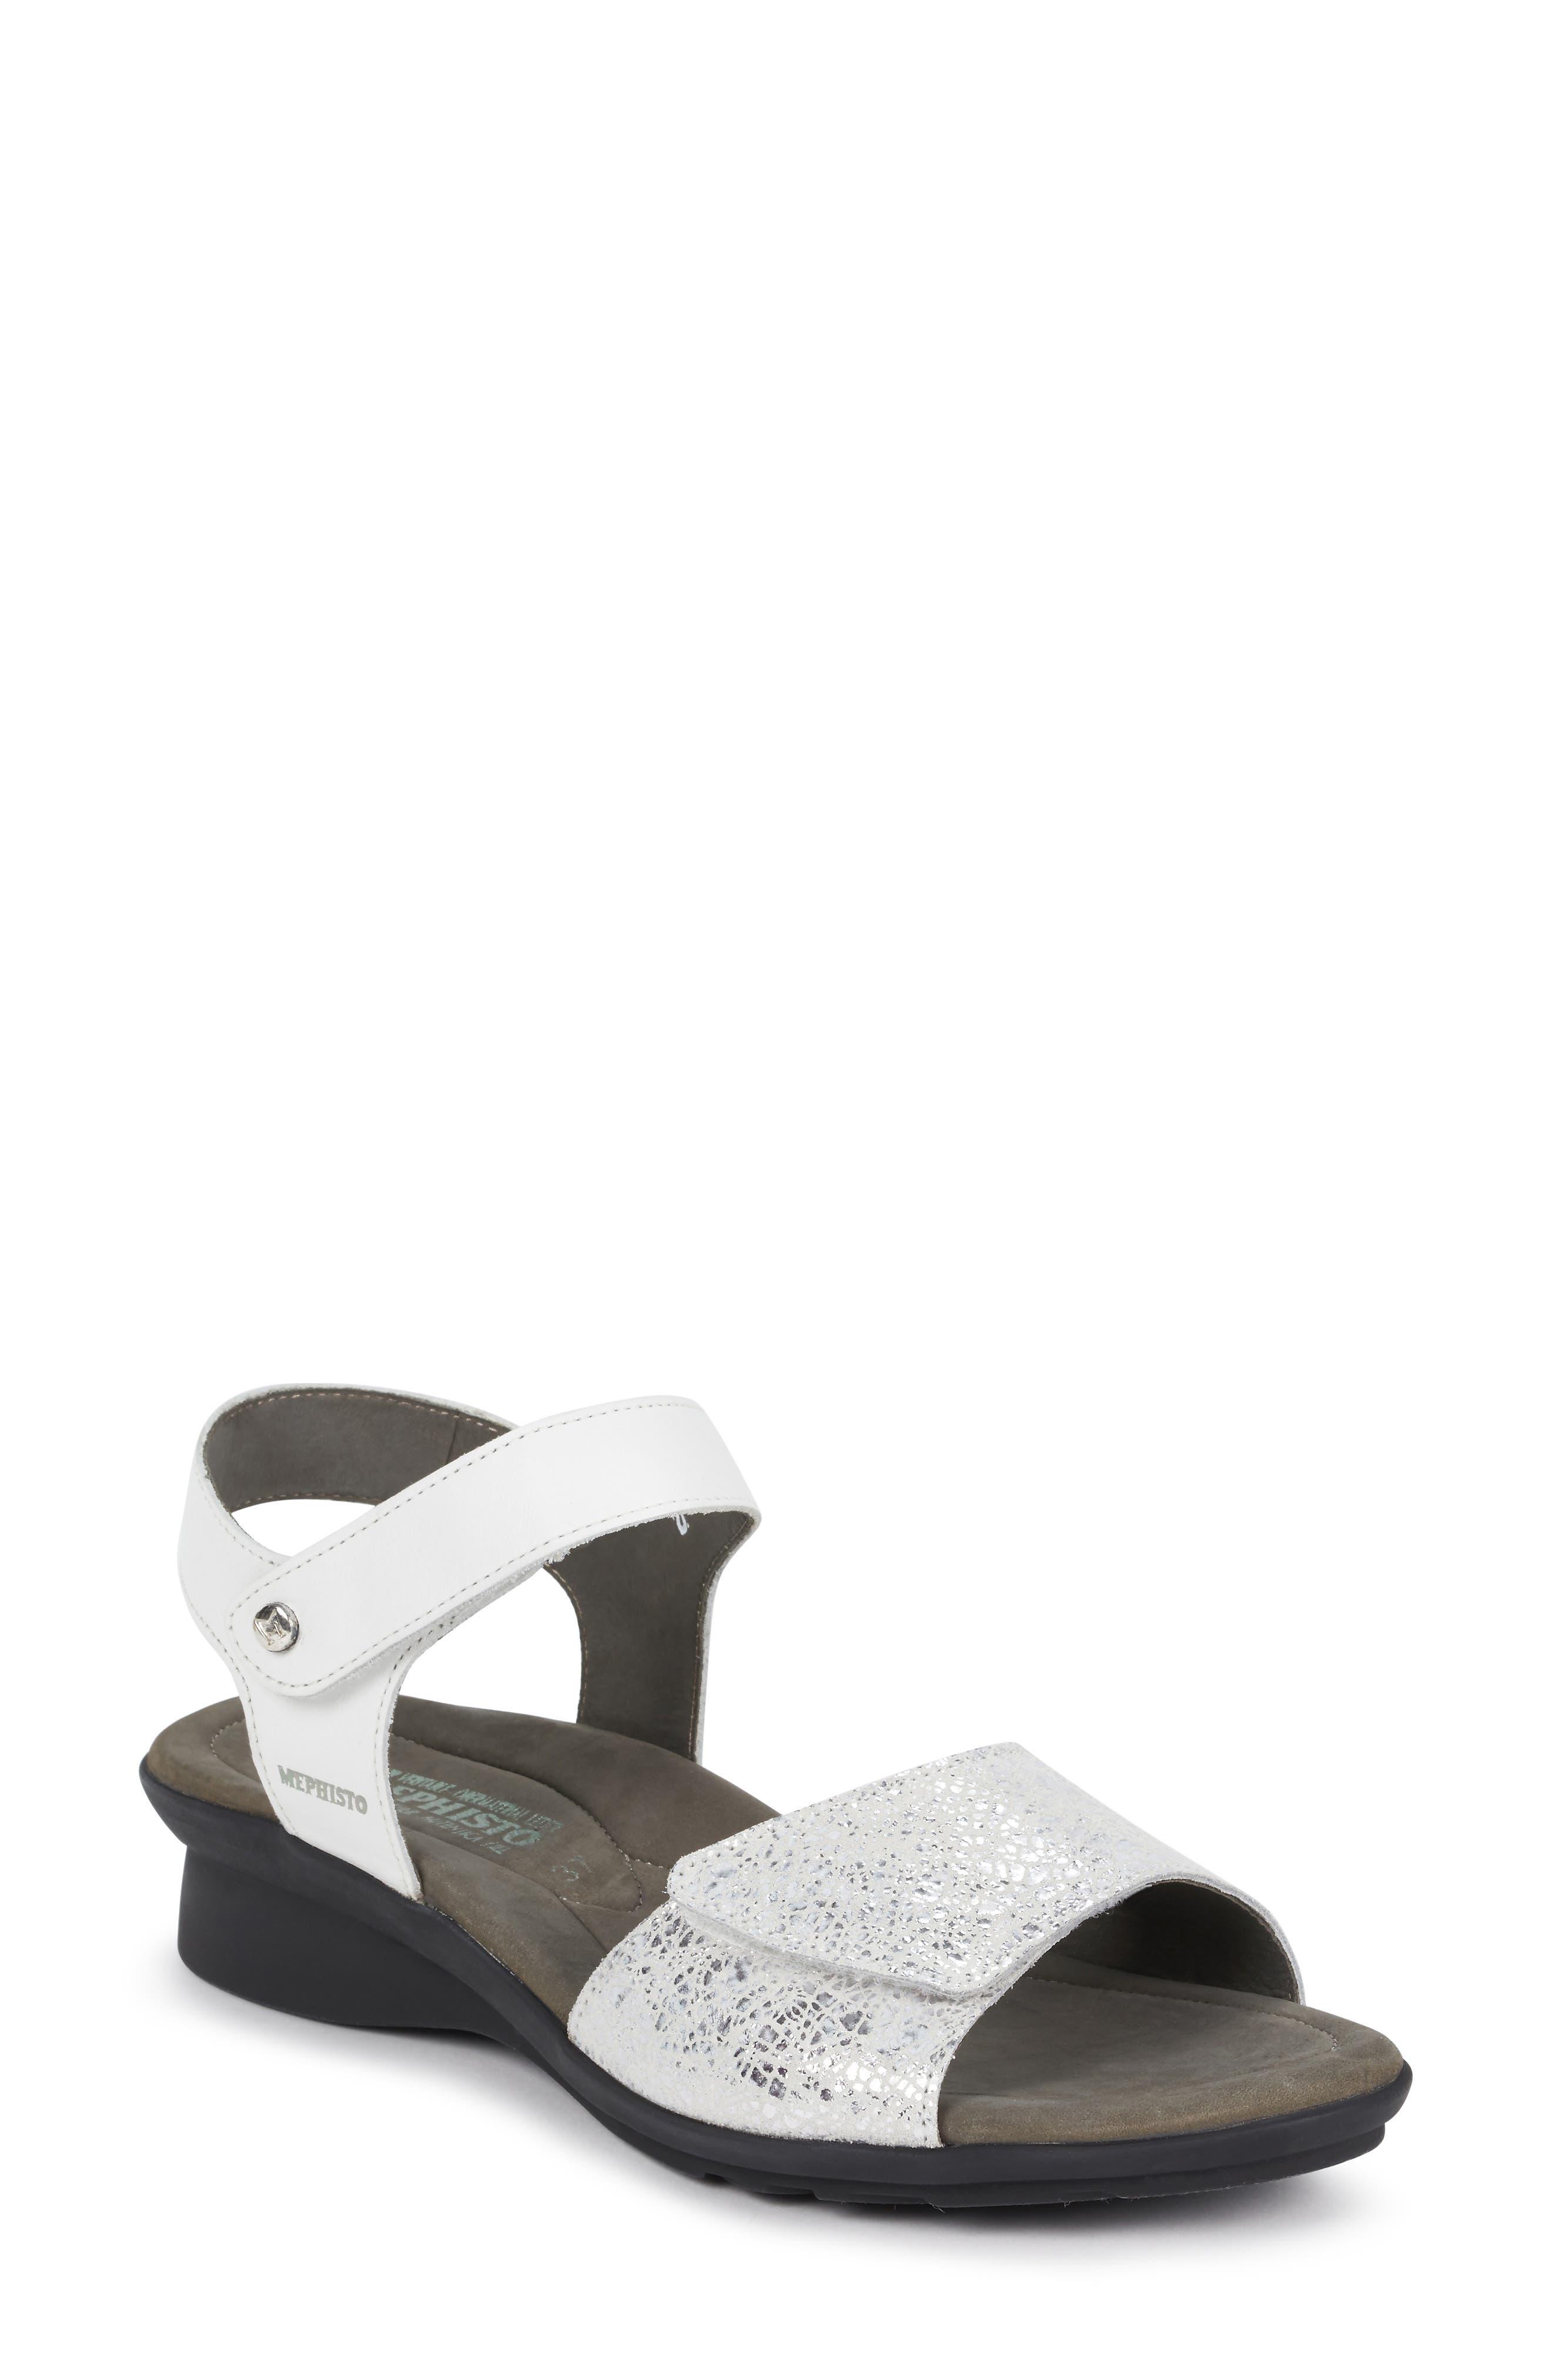 MEPHISTO Pattie Sandal, Main, color, WHITE